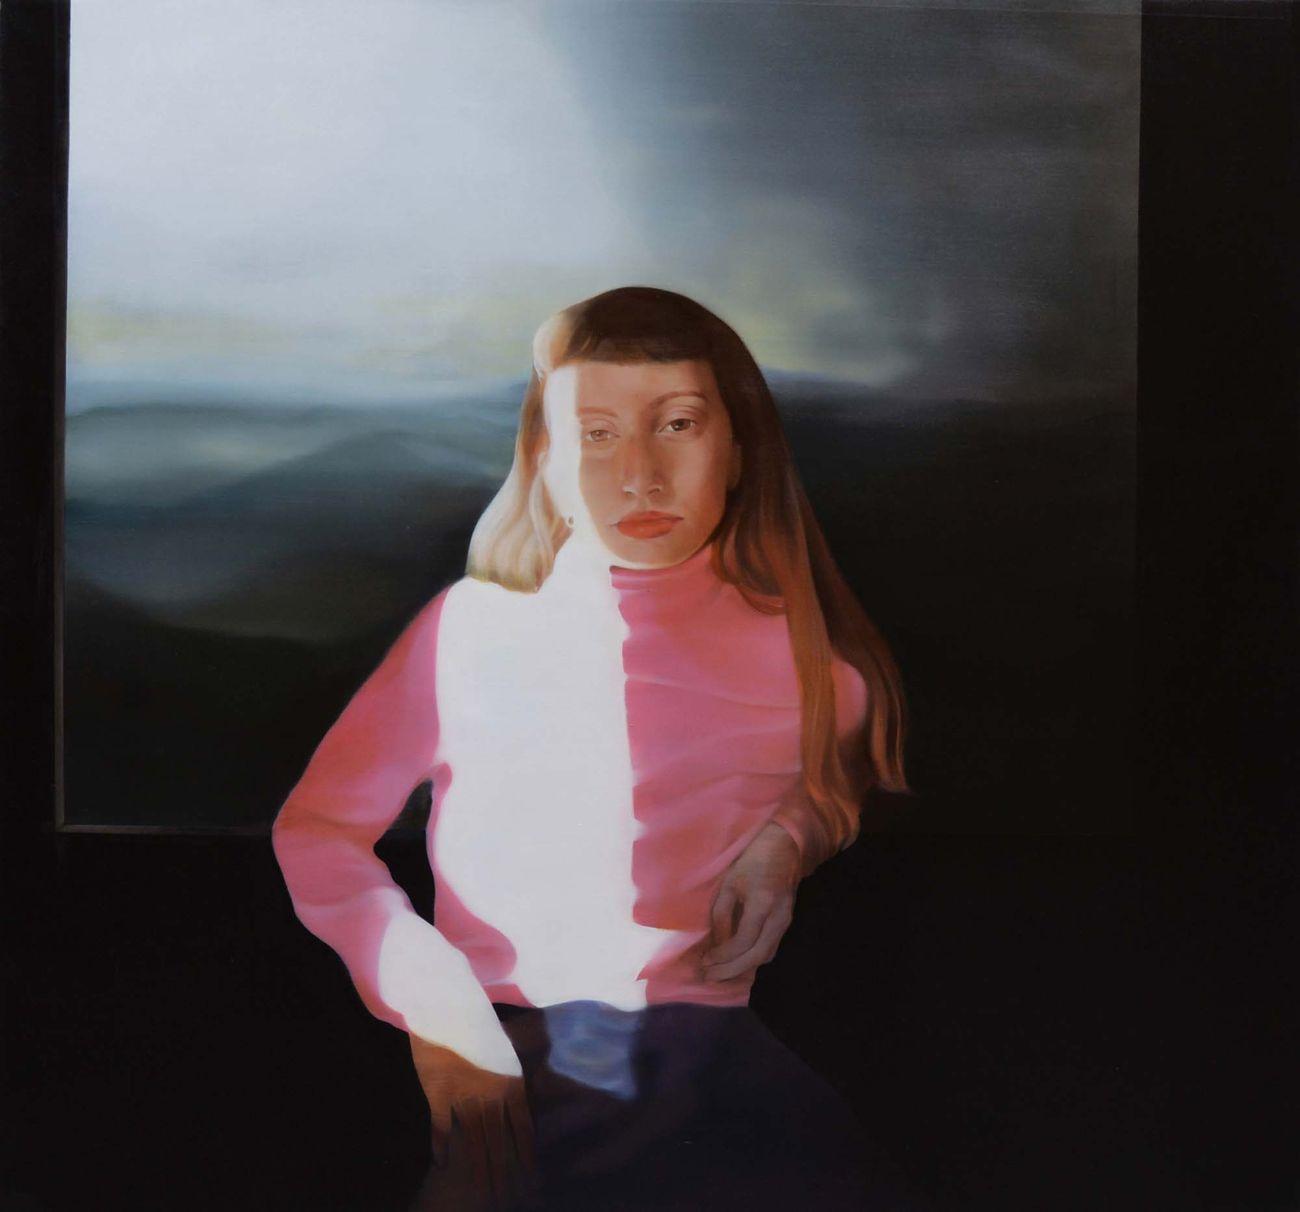 Margherita Mezzetti, Benedetta, 2019, olio su tela, 151 x 161 cm